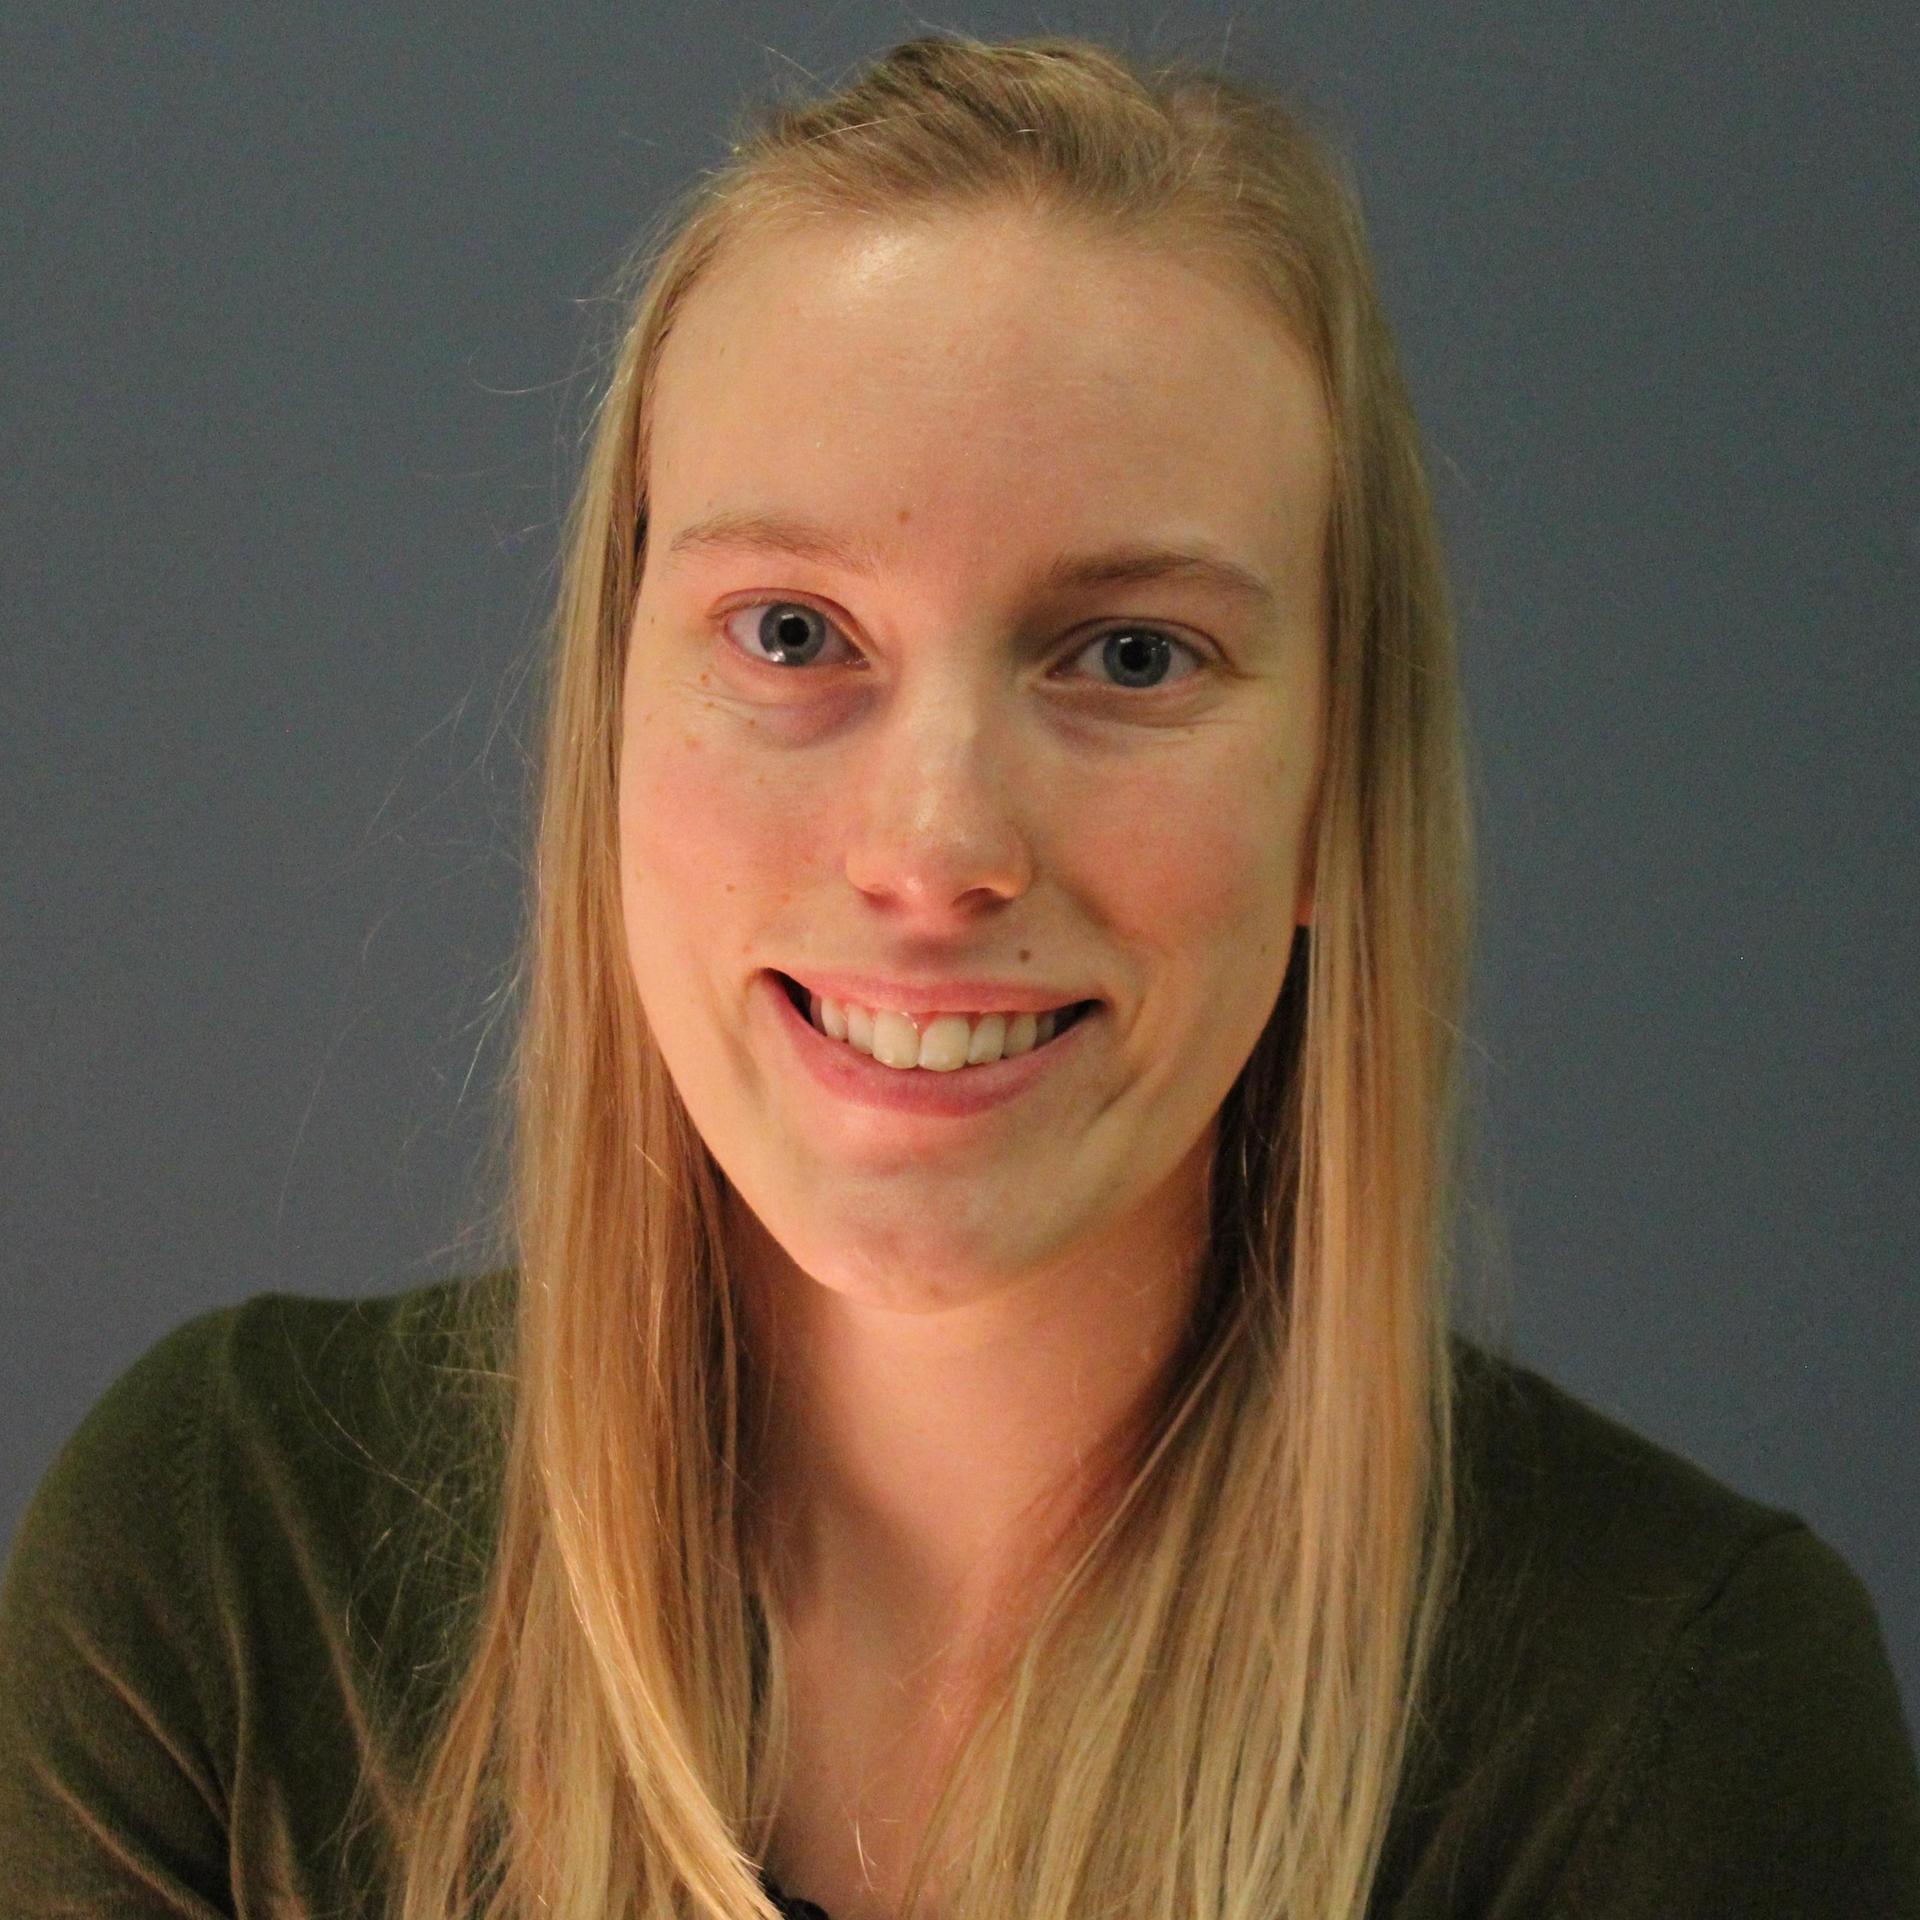 Brittany Gundale